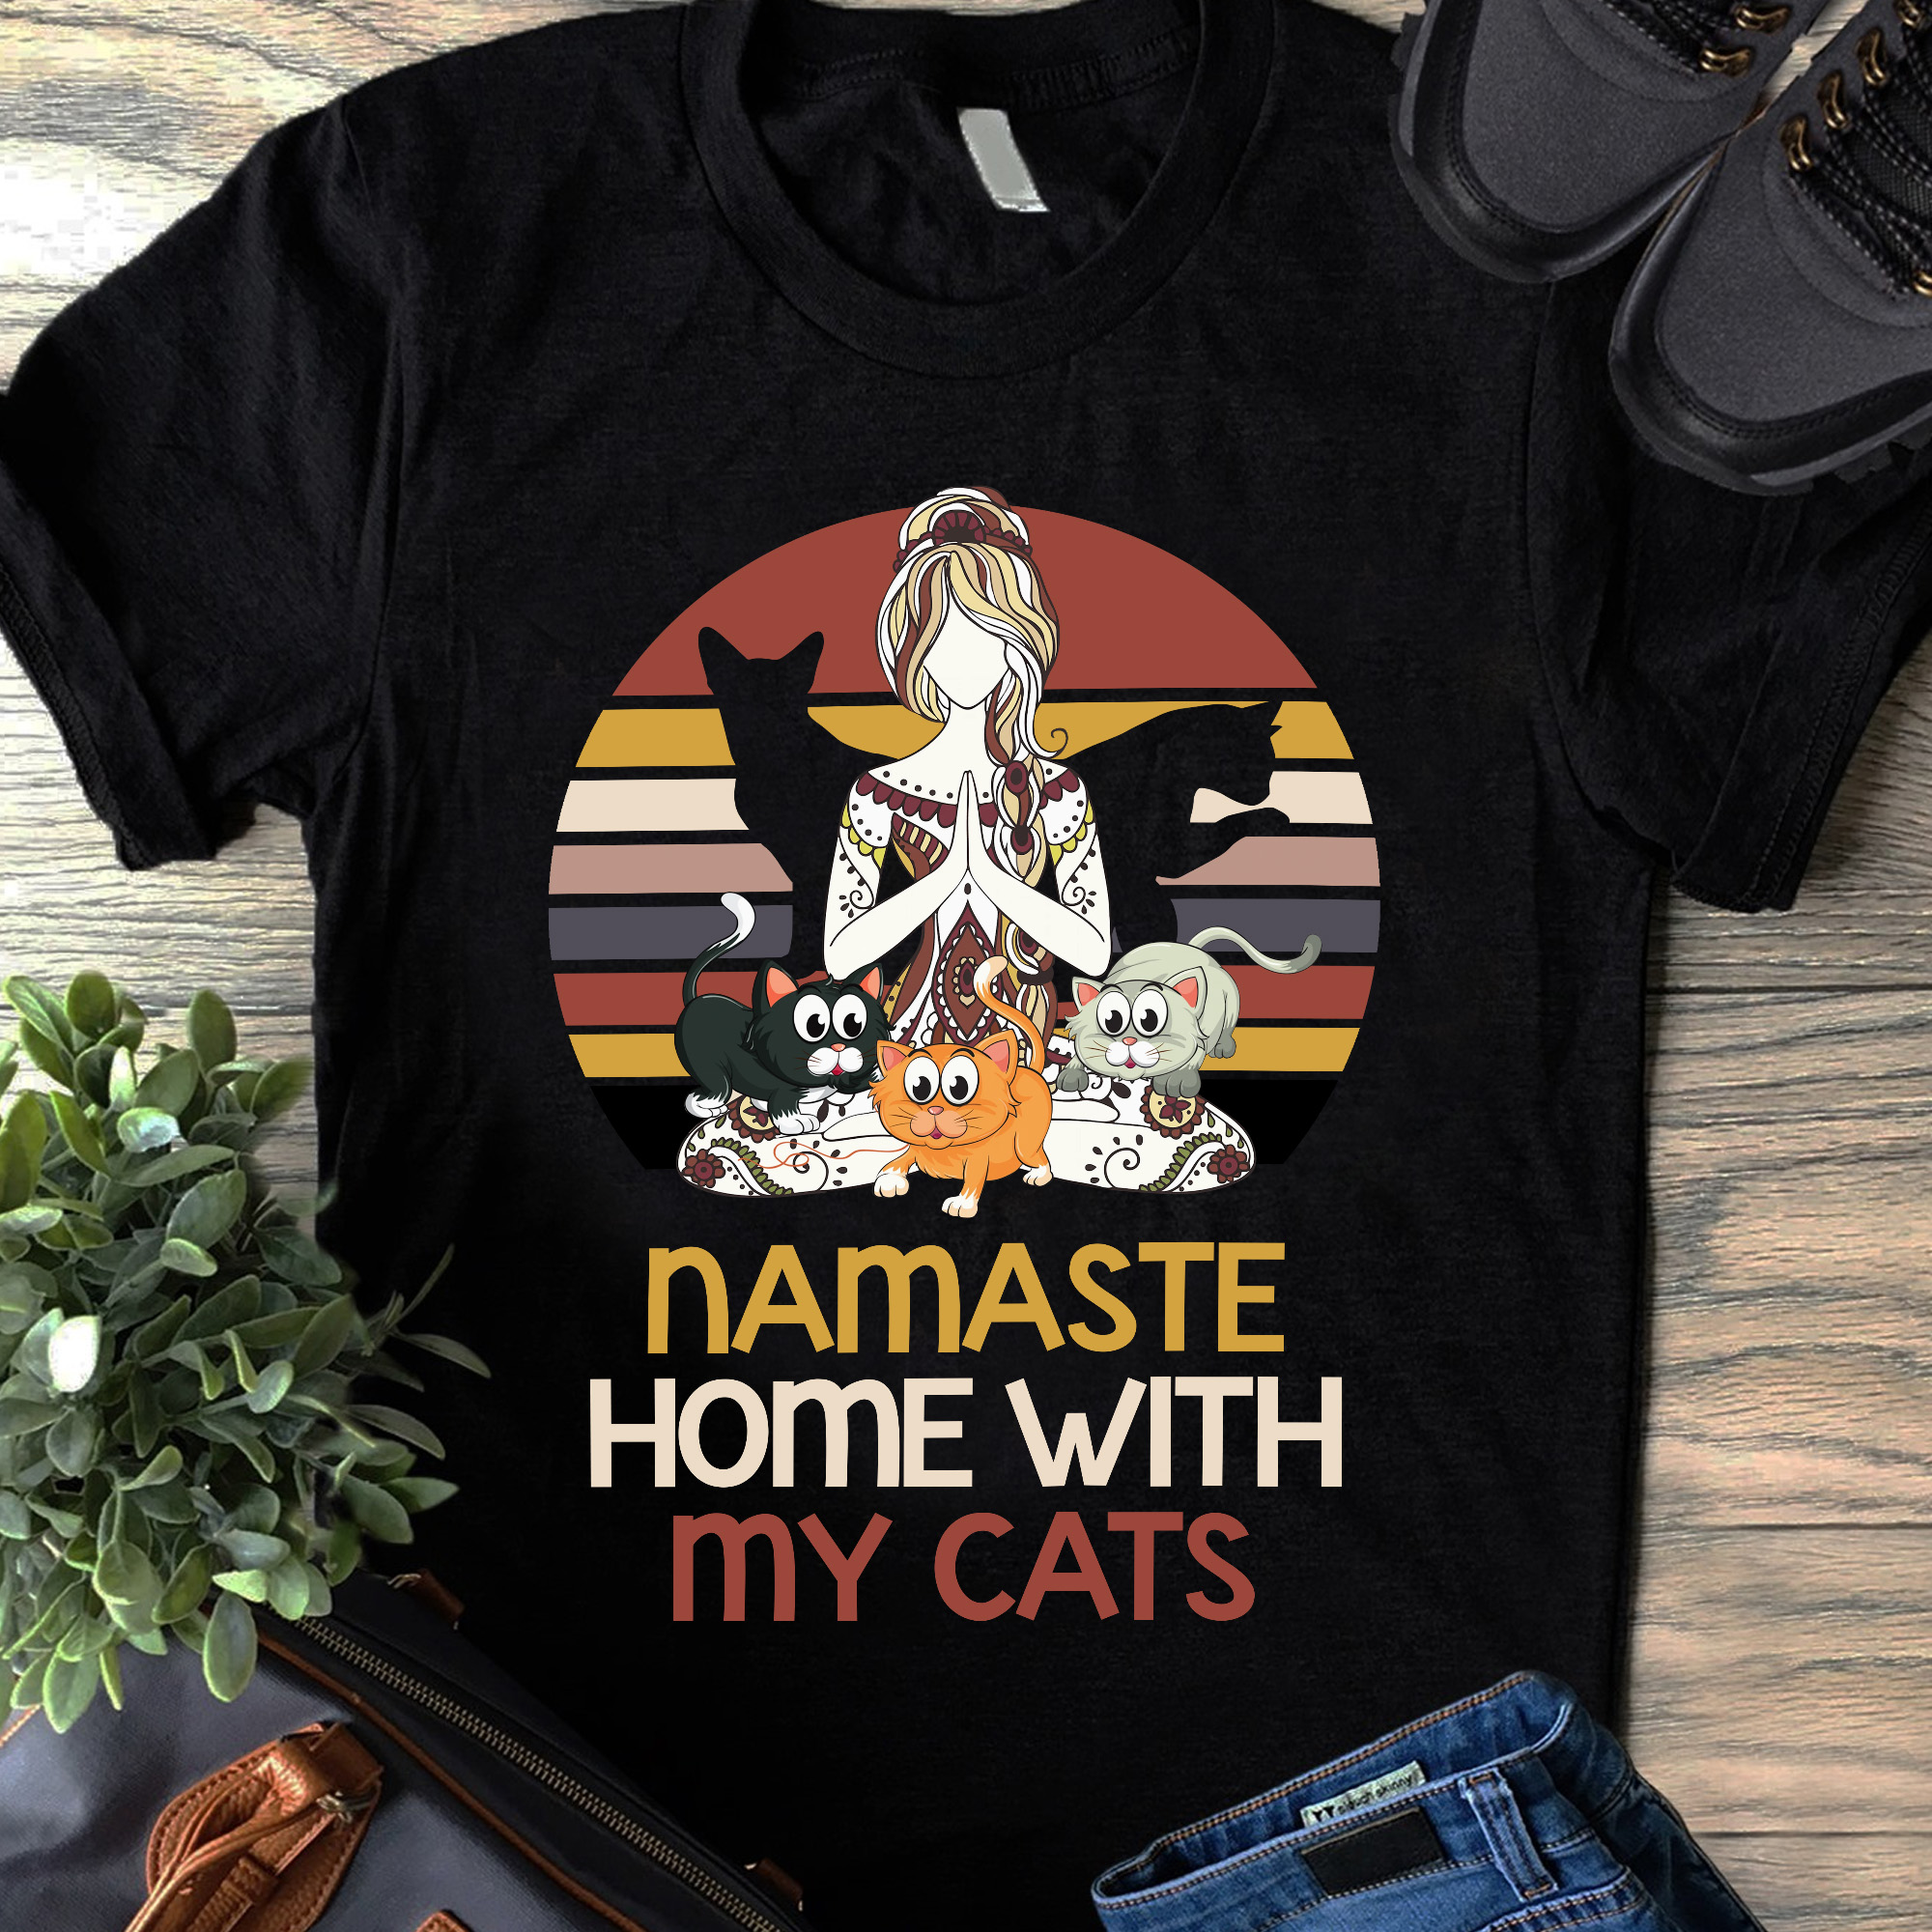 Vintage Namaste Shirt Namaste Home With My Cats